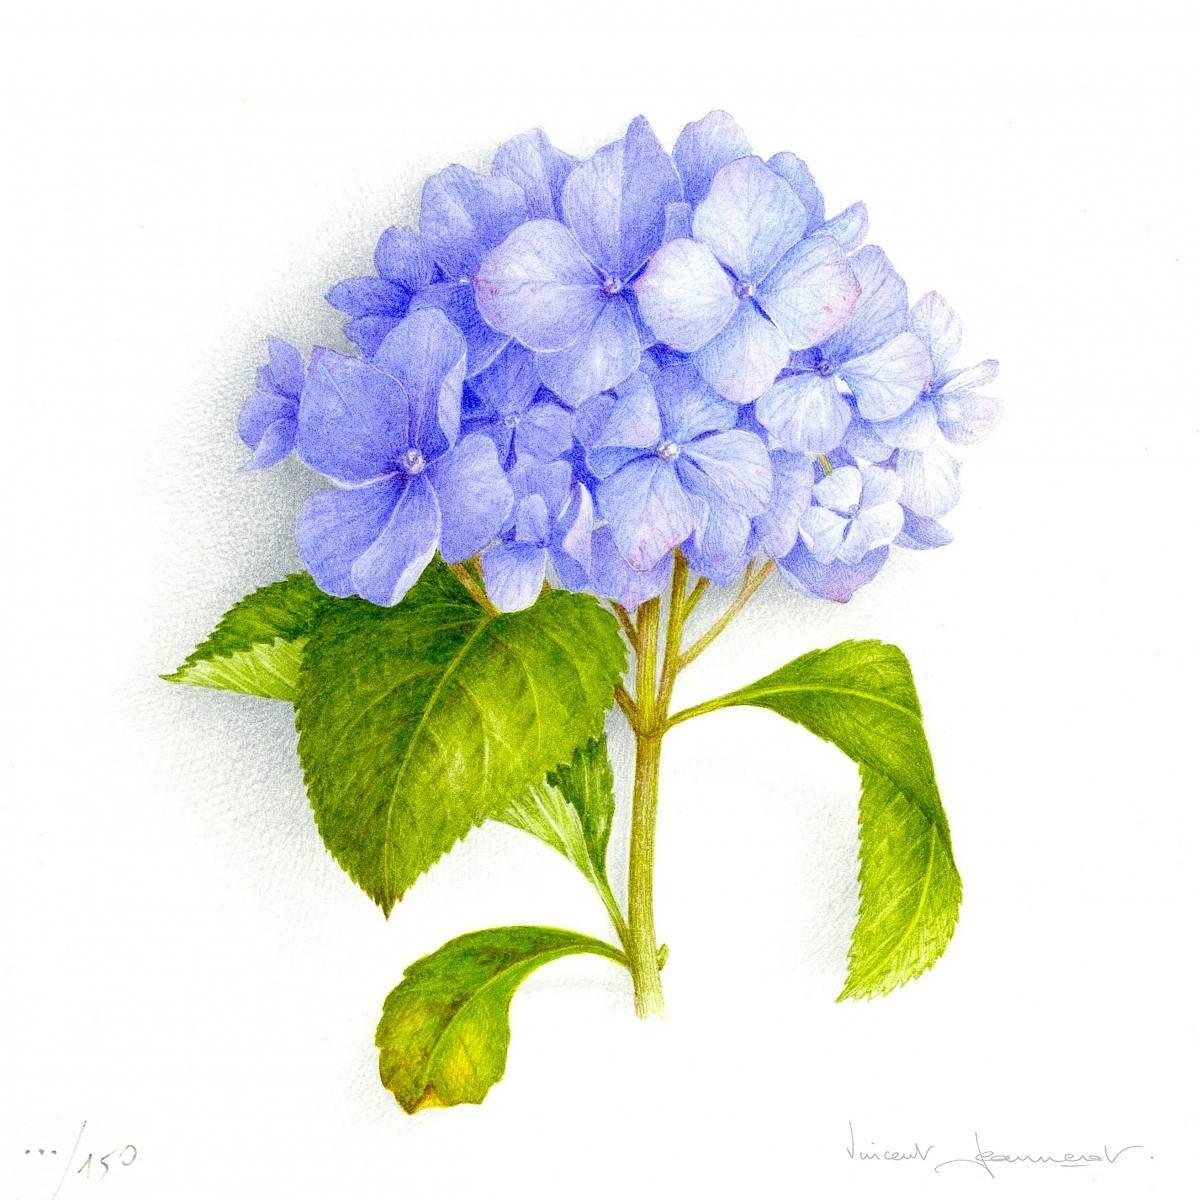 Blue Hydrangea Hortensia Bleu Dessins Botaniques Dessin Botanique